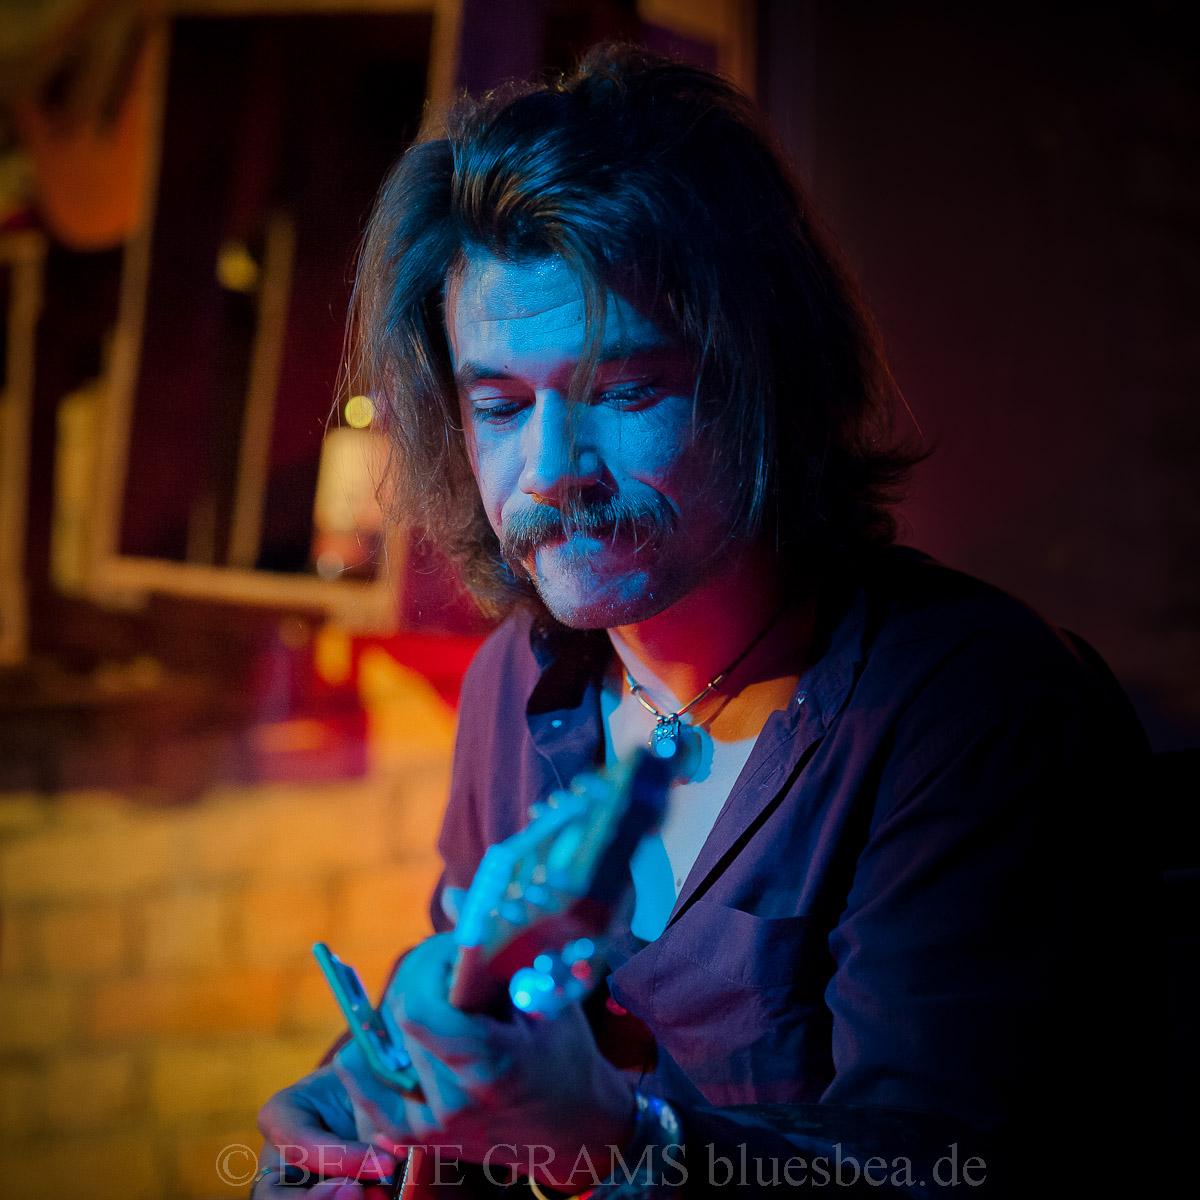 Ralph de Jongh - 31.07.2019 - Spieker Eckernförde